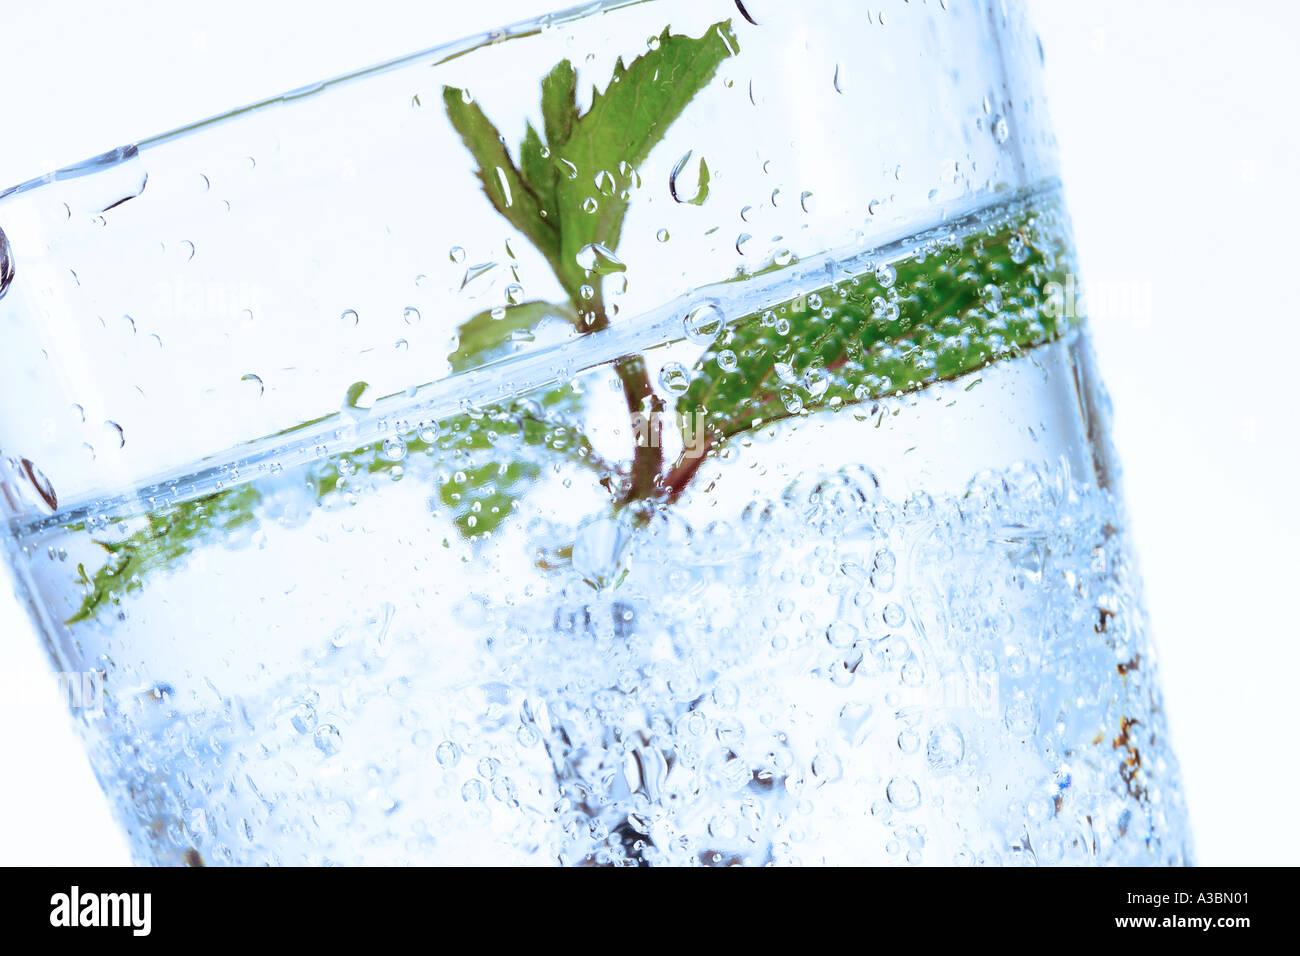 Agua mineral con hoja de menta Imagen De Stock